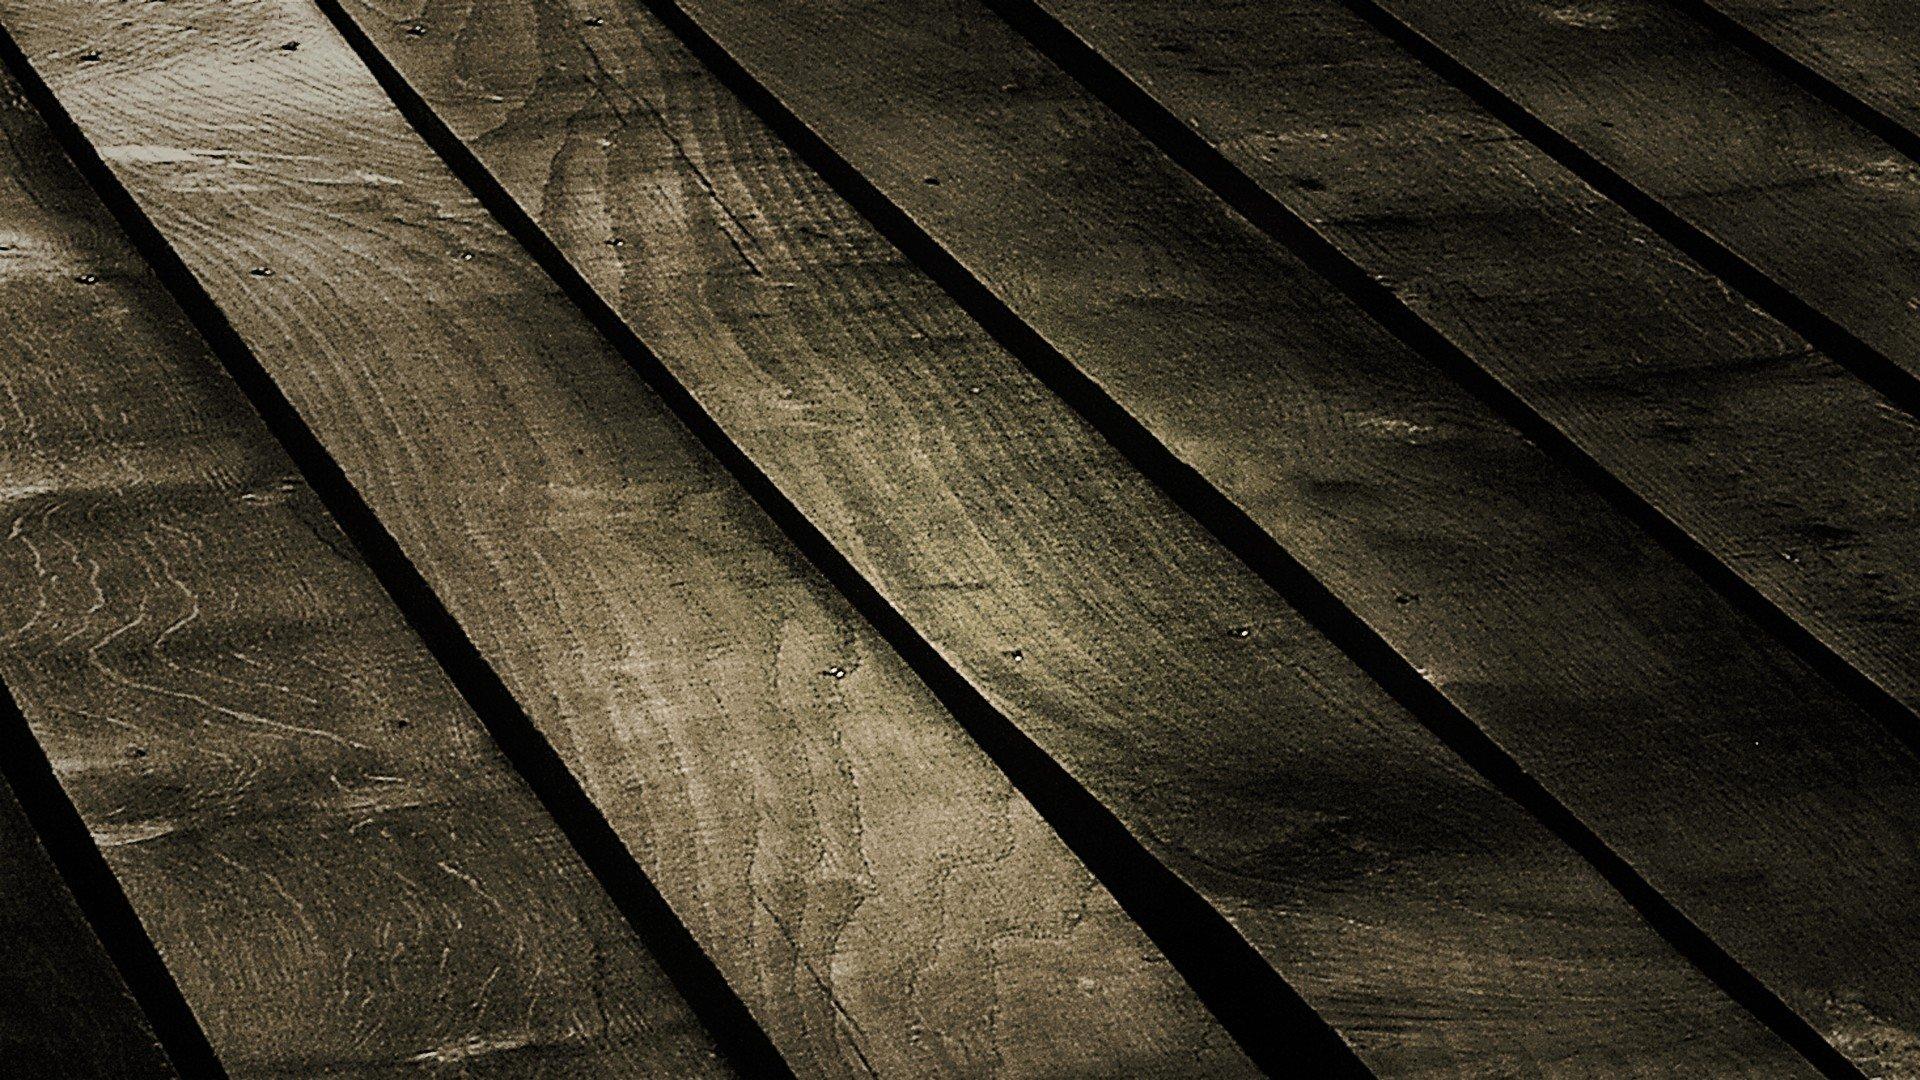 Wood wood panels wood floor wallpaper   1920x1080   311657   WallpaperUP. Wood wood panels wood floor wallpaper   1920x1080   311657